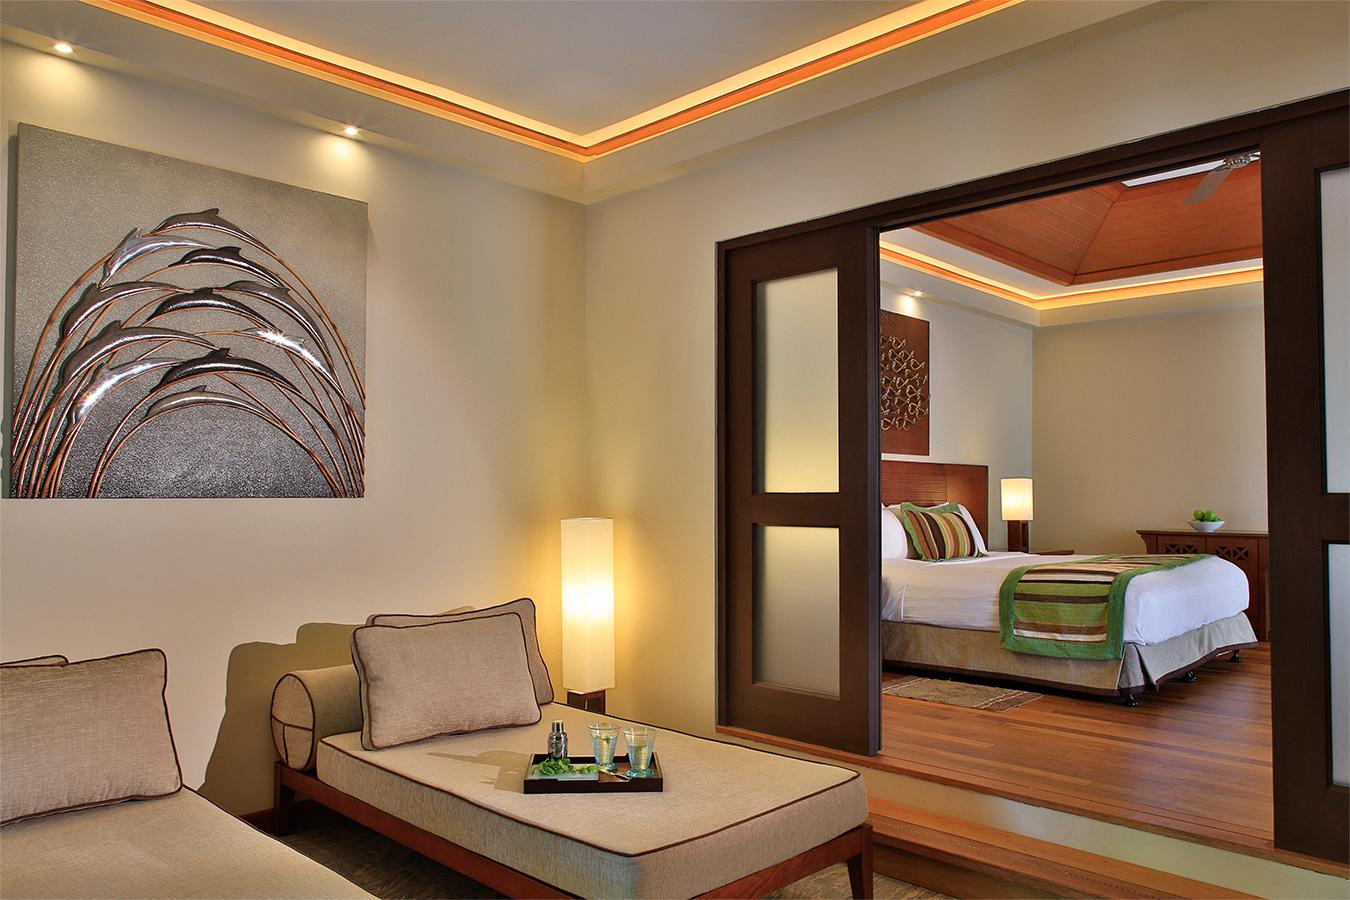 Kurumba Maldives - Garden Pool Villa Lounge Image - Maldives Resort